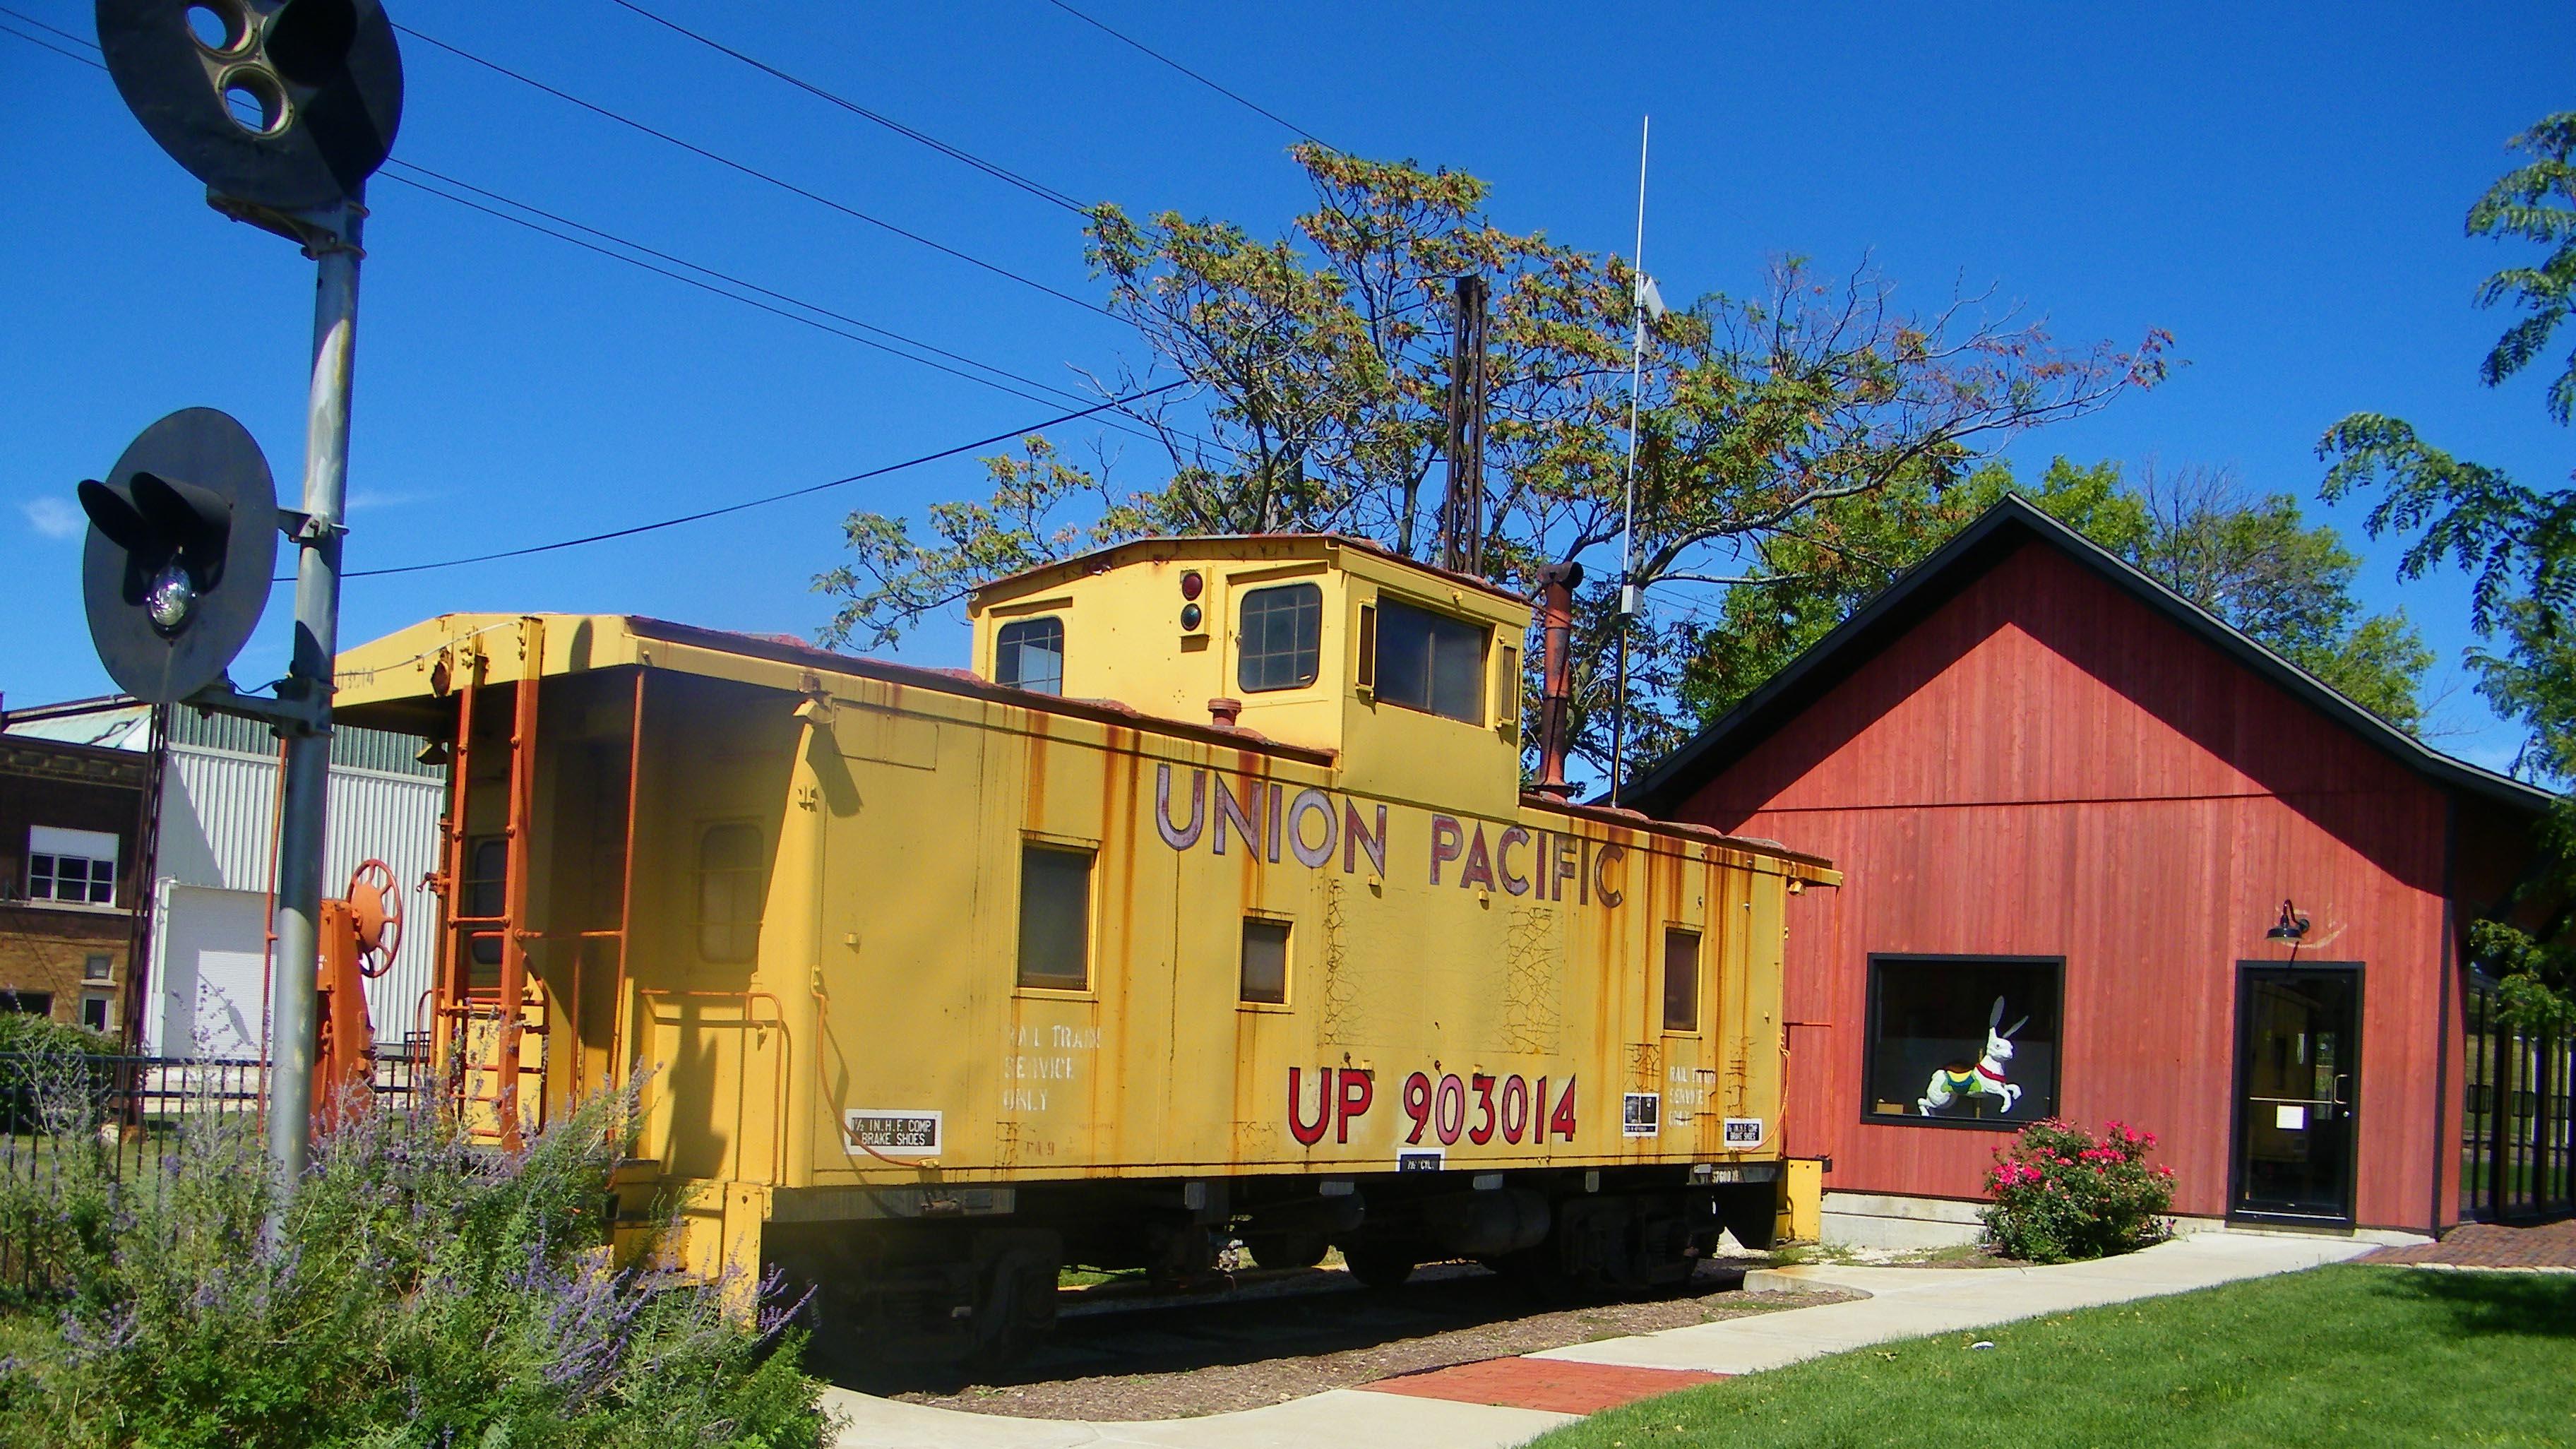 kankakee model railroad club and museum enjoy illinois